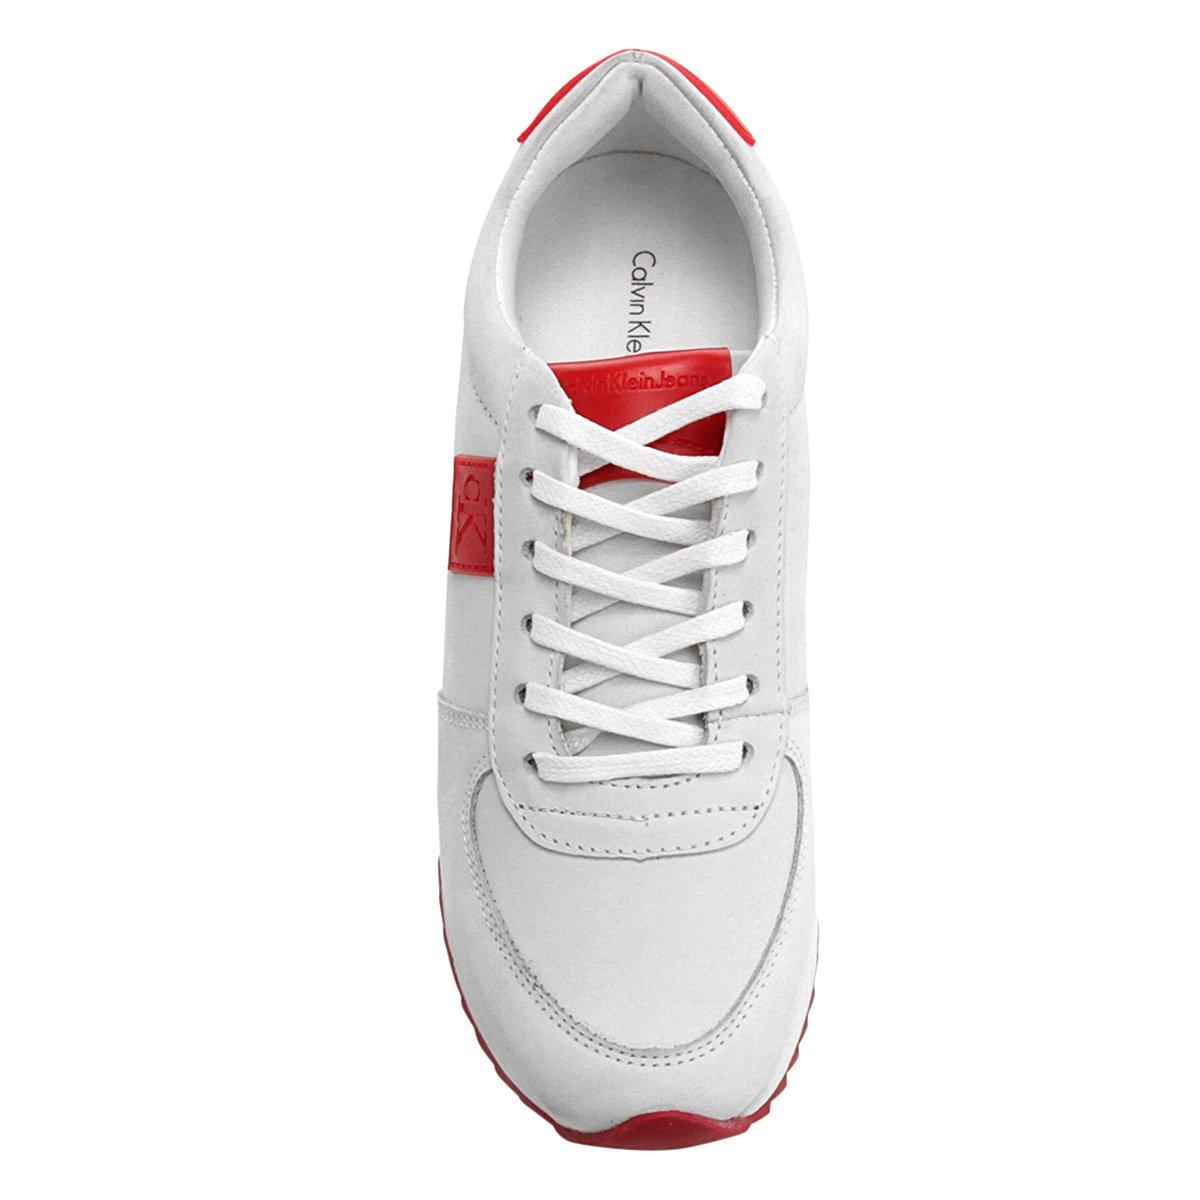 Feminino Tênis Feminino Branco Couro Couro Jogging Calvin Klein Klein Calvin Tênis Jogging pq6wZxR4x